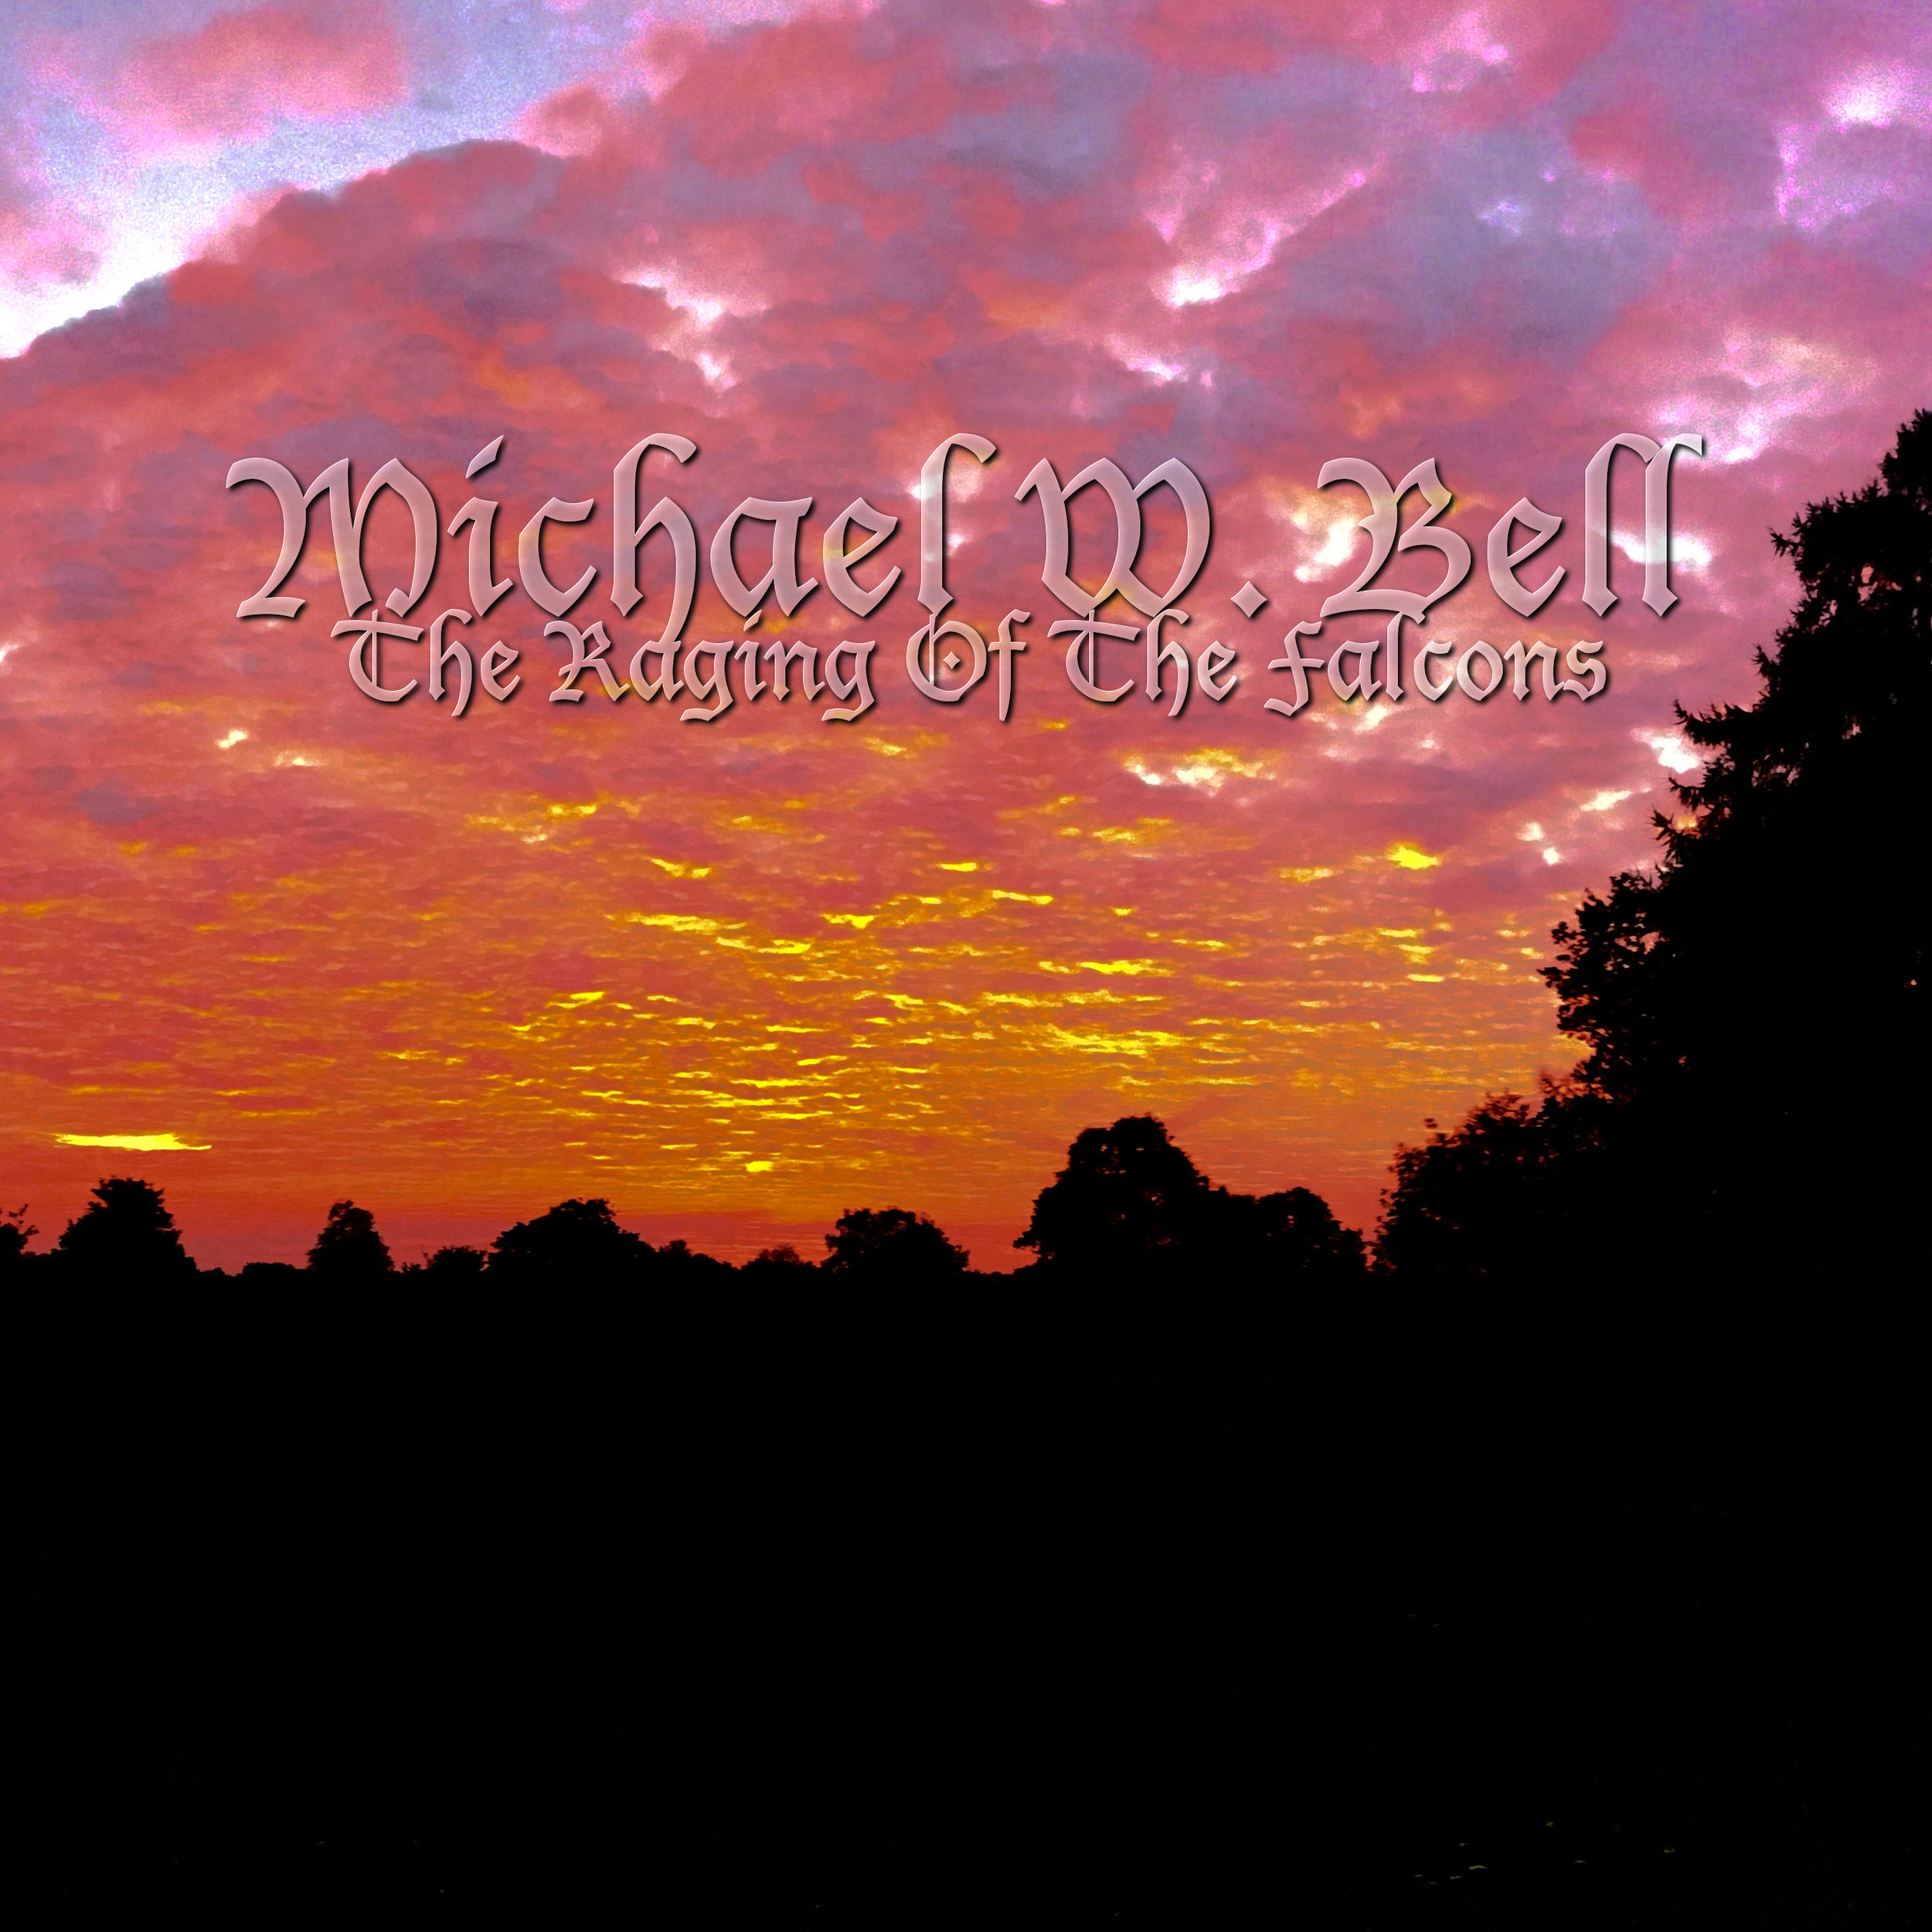 MICHAEL W. BELLThe Raging of the Falcons - AEP0005 - SingleGenre: Film ScoreReleased: 22.04.2016